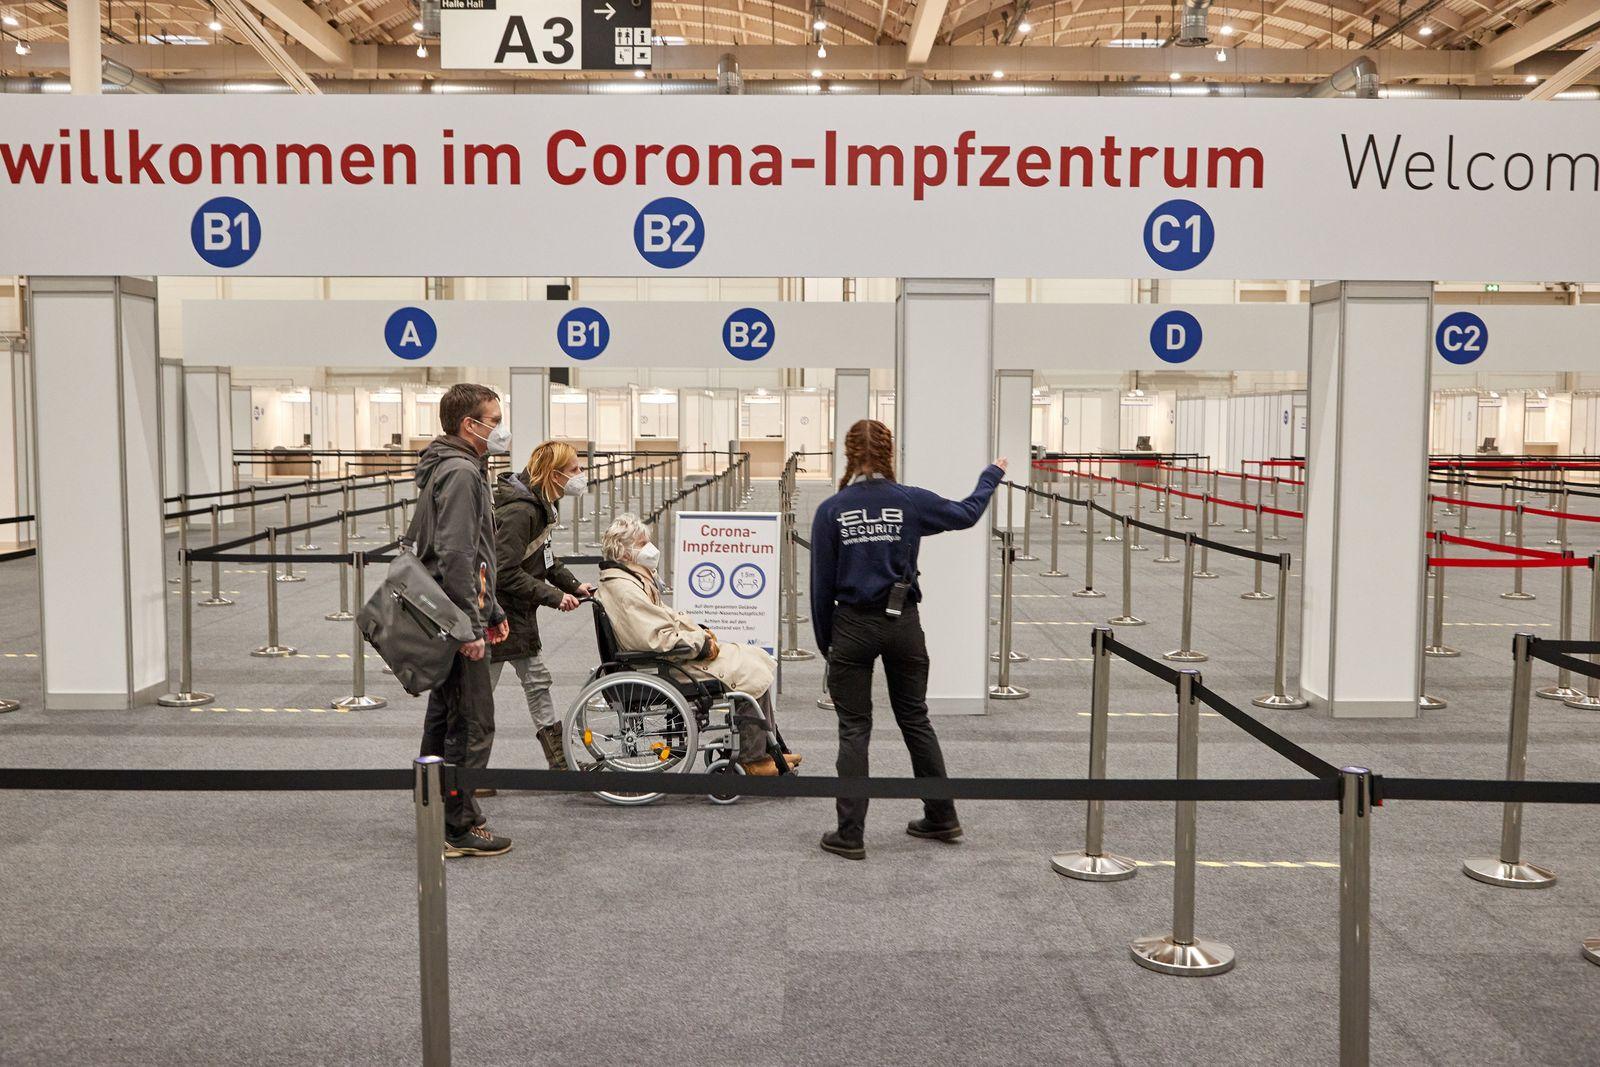 Coronavirus - Impfzentrum Hamburger Messehallen